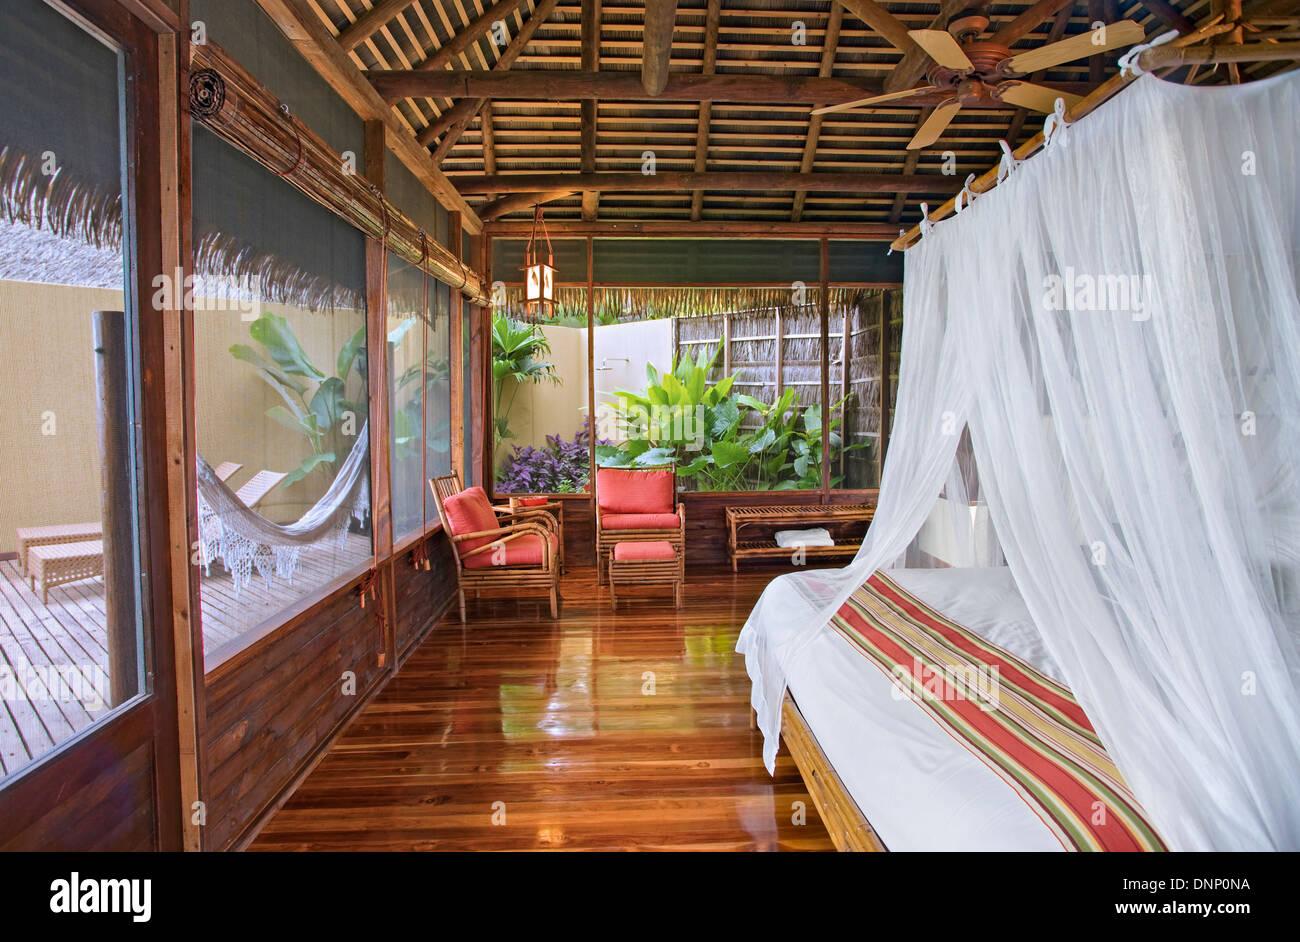 Eco Lodge Costa Rica Stock Photos & Eco Lodge Costa Rica Stock ...